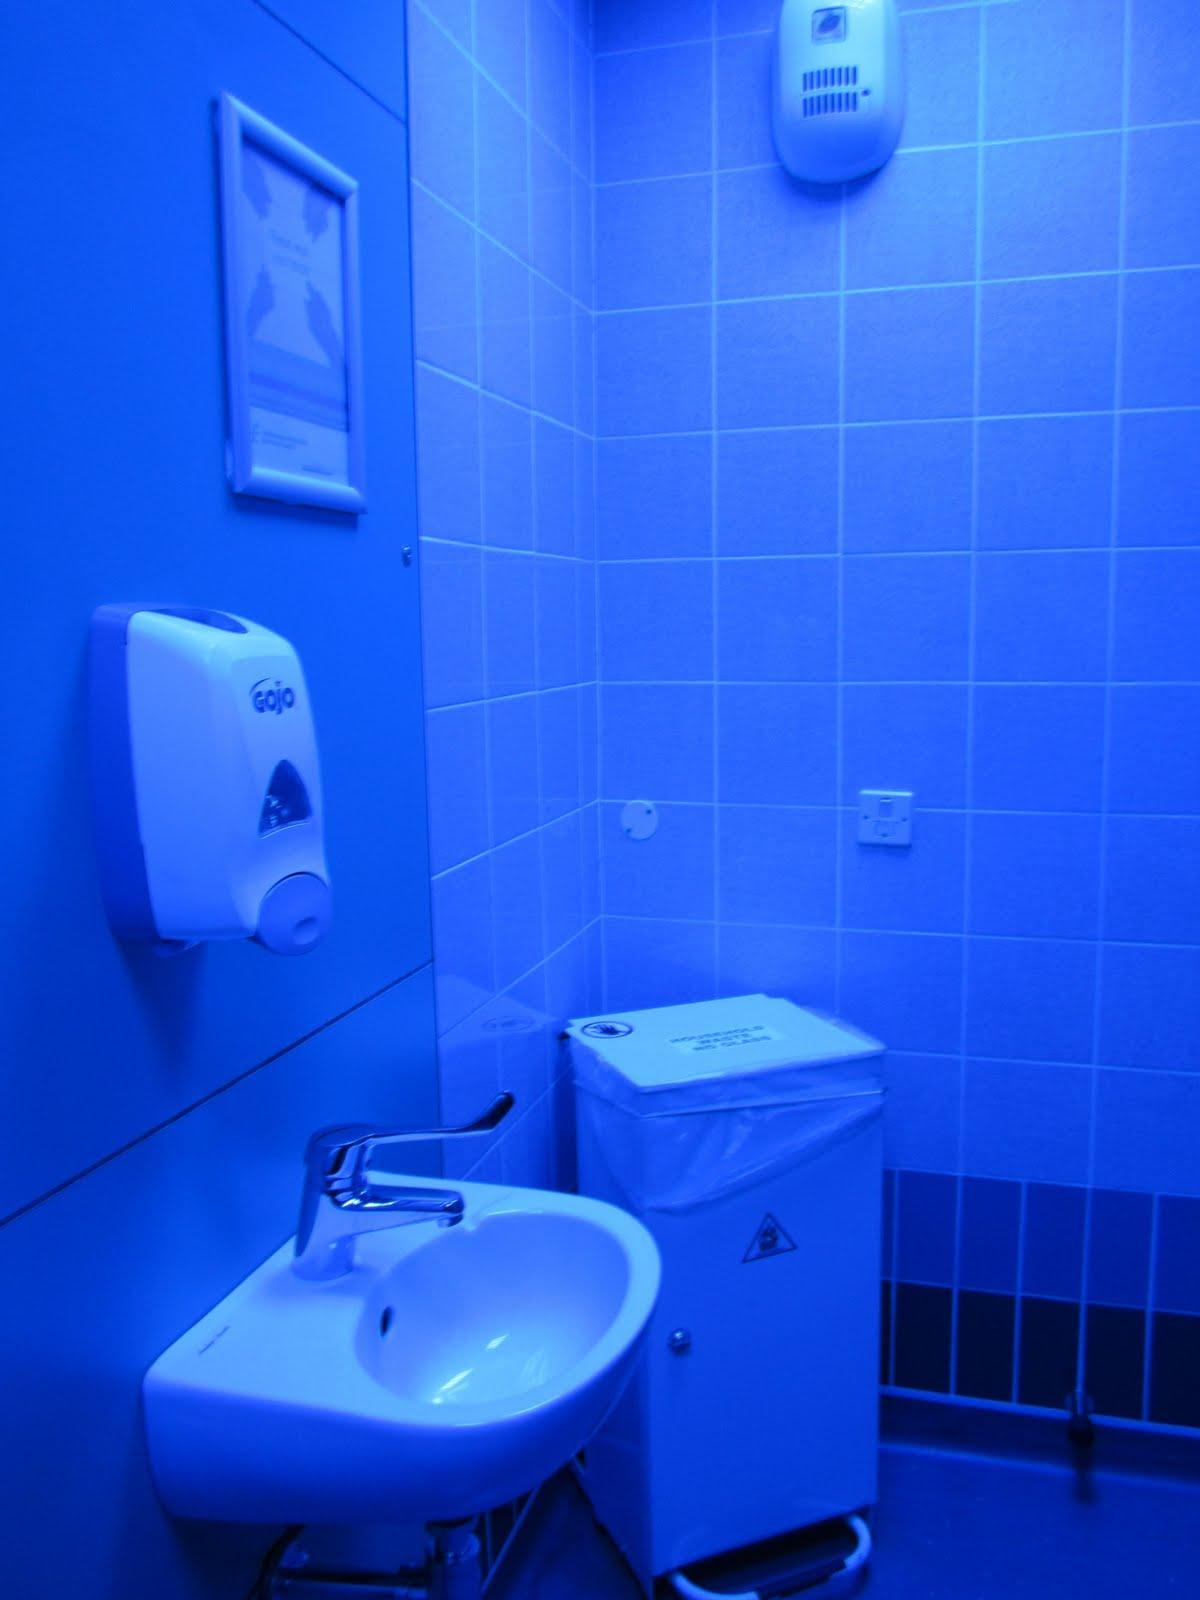 The McCall Clan The Rotunda Hospital - Blue lights in bathroom